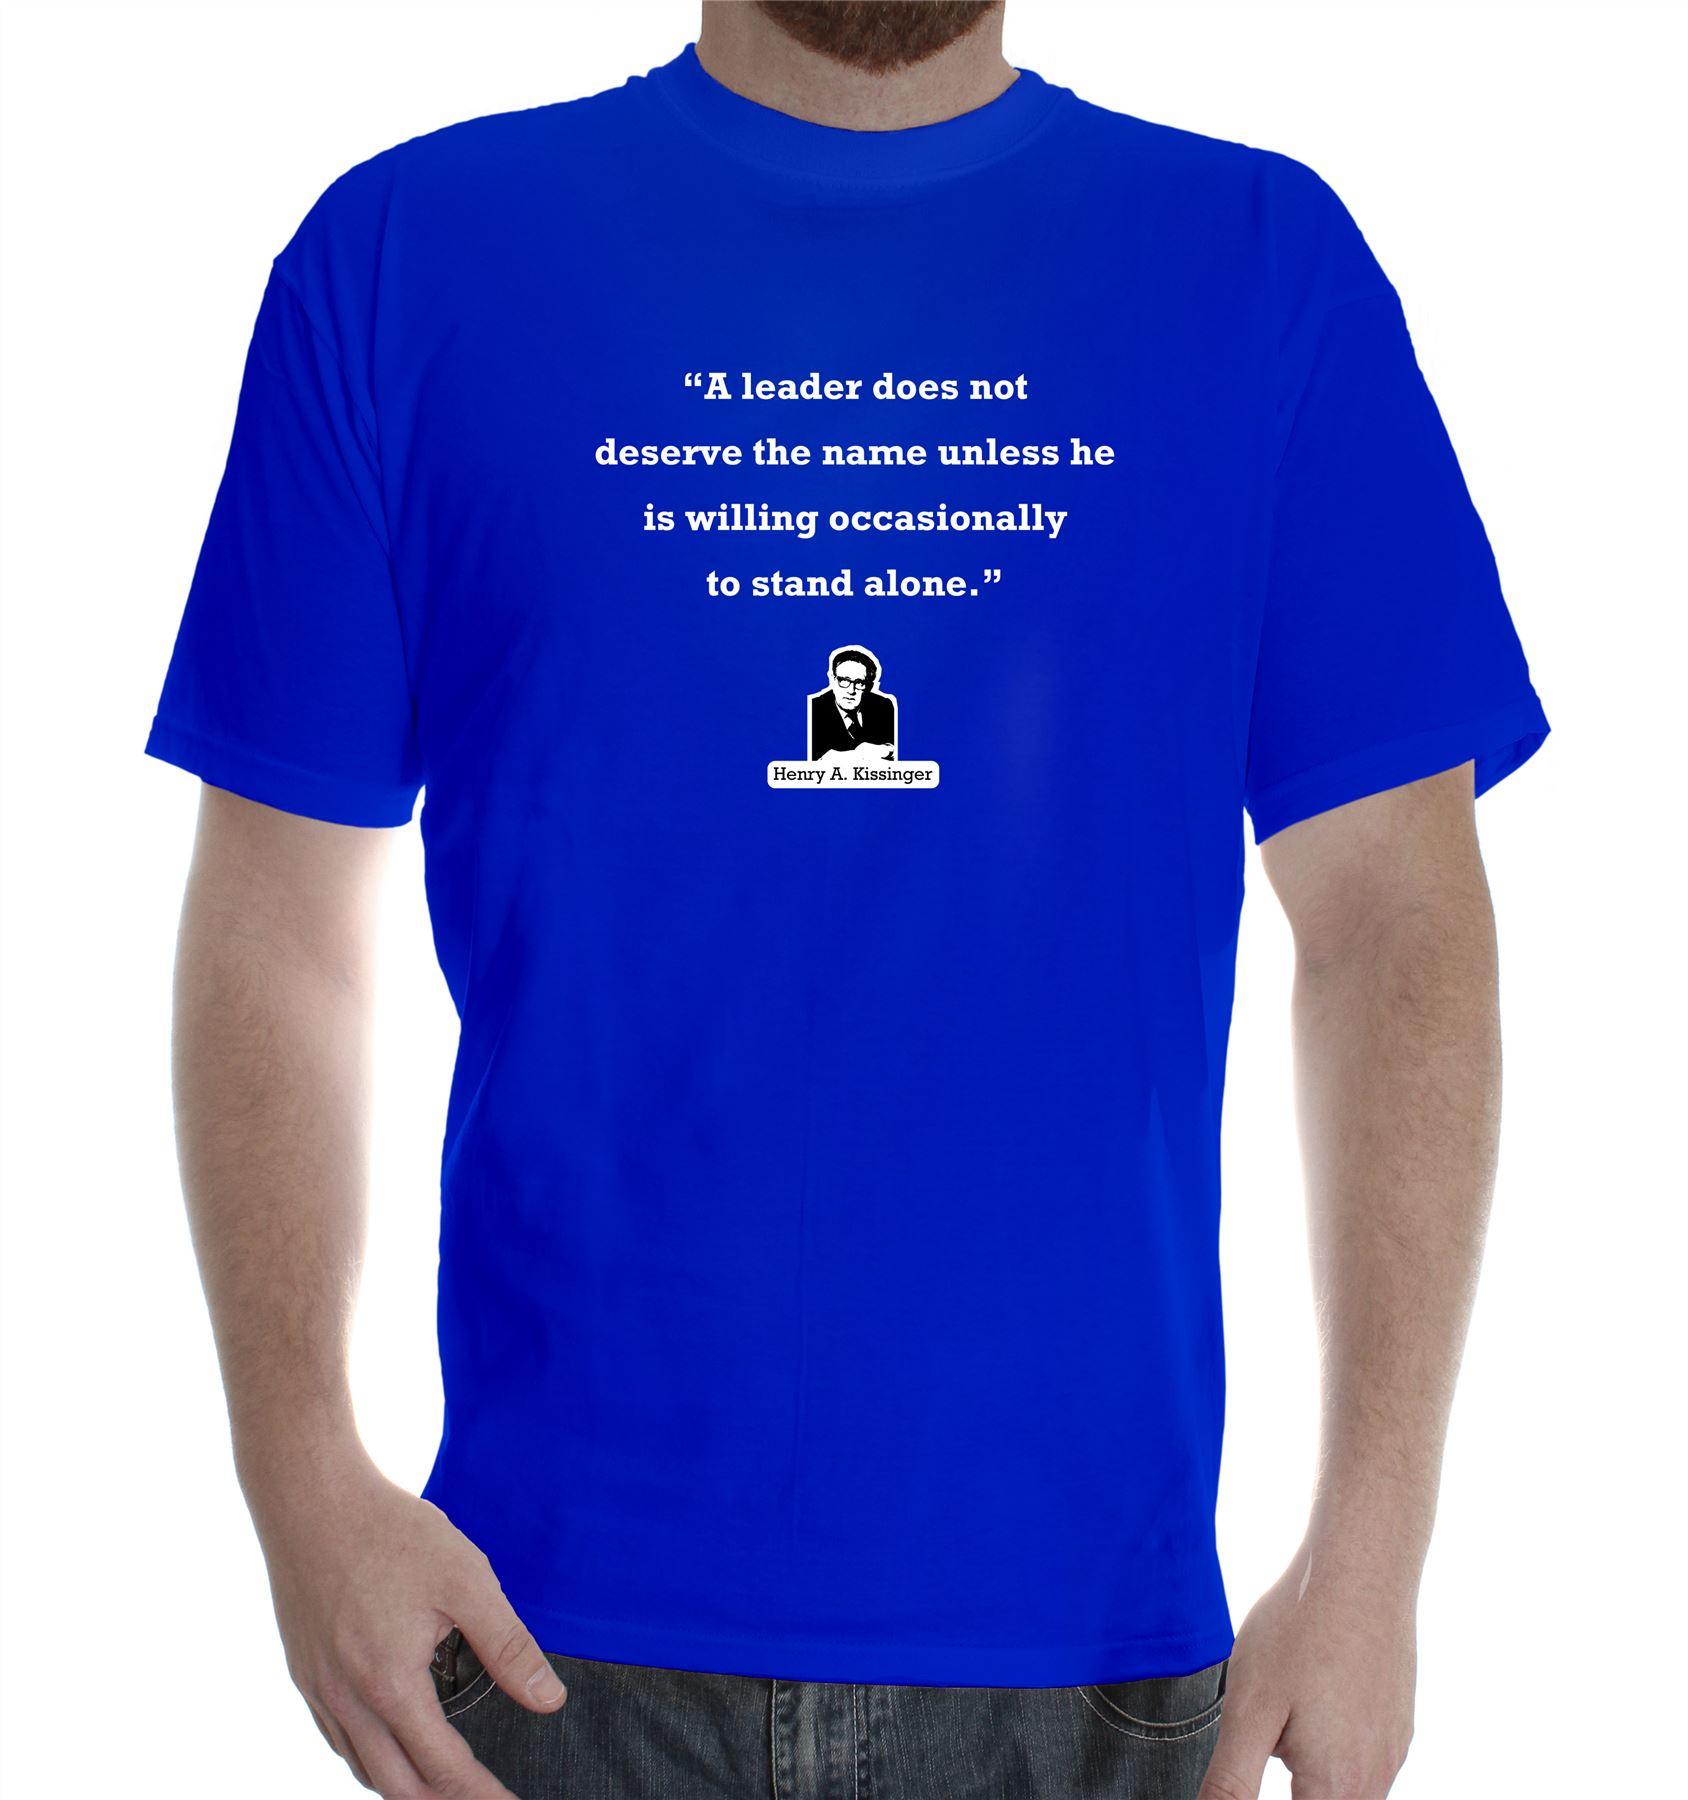 Mens Printed Cotton T Shirt Tee Shirt Design Martin Luther